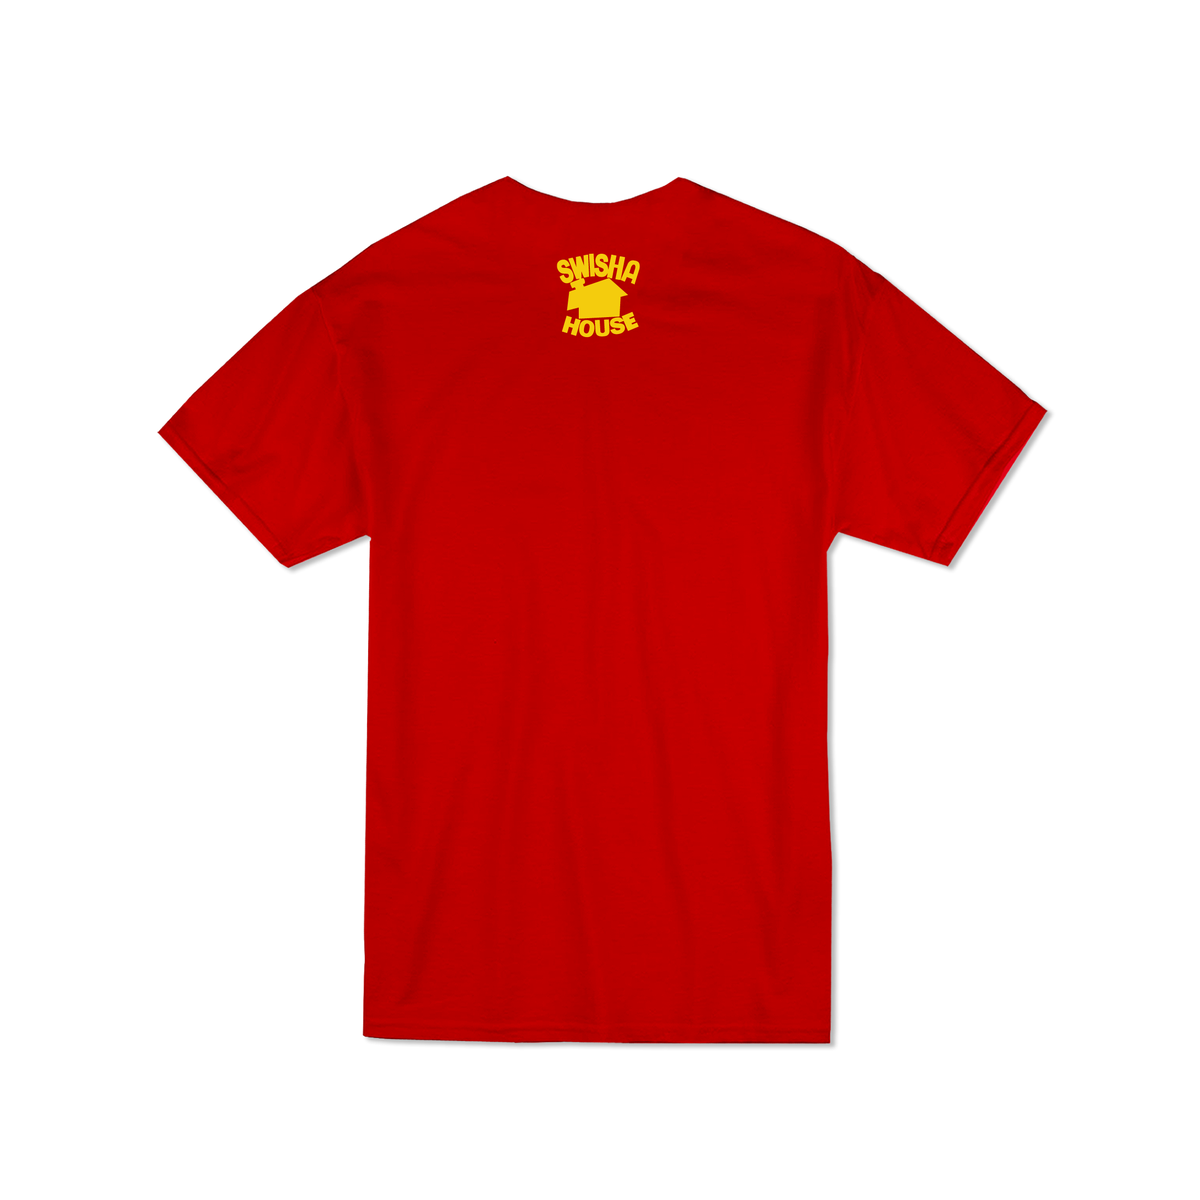 Image of Swishahouse Blast Off (Limited Edition) T Shirt